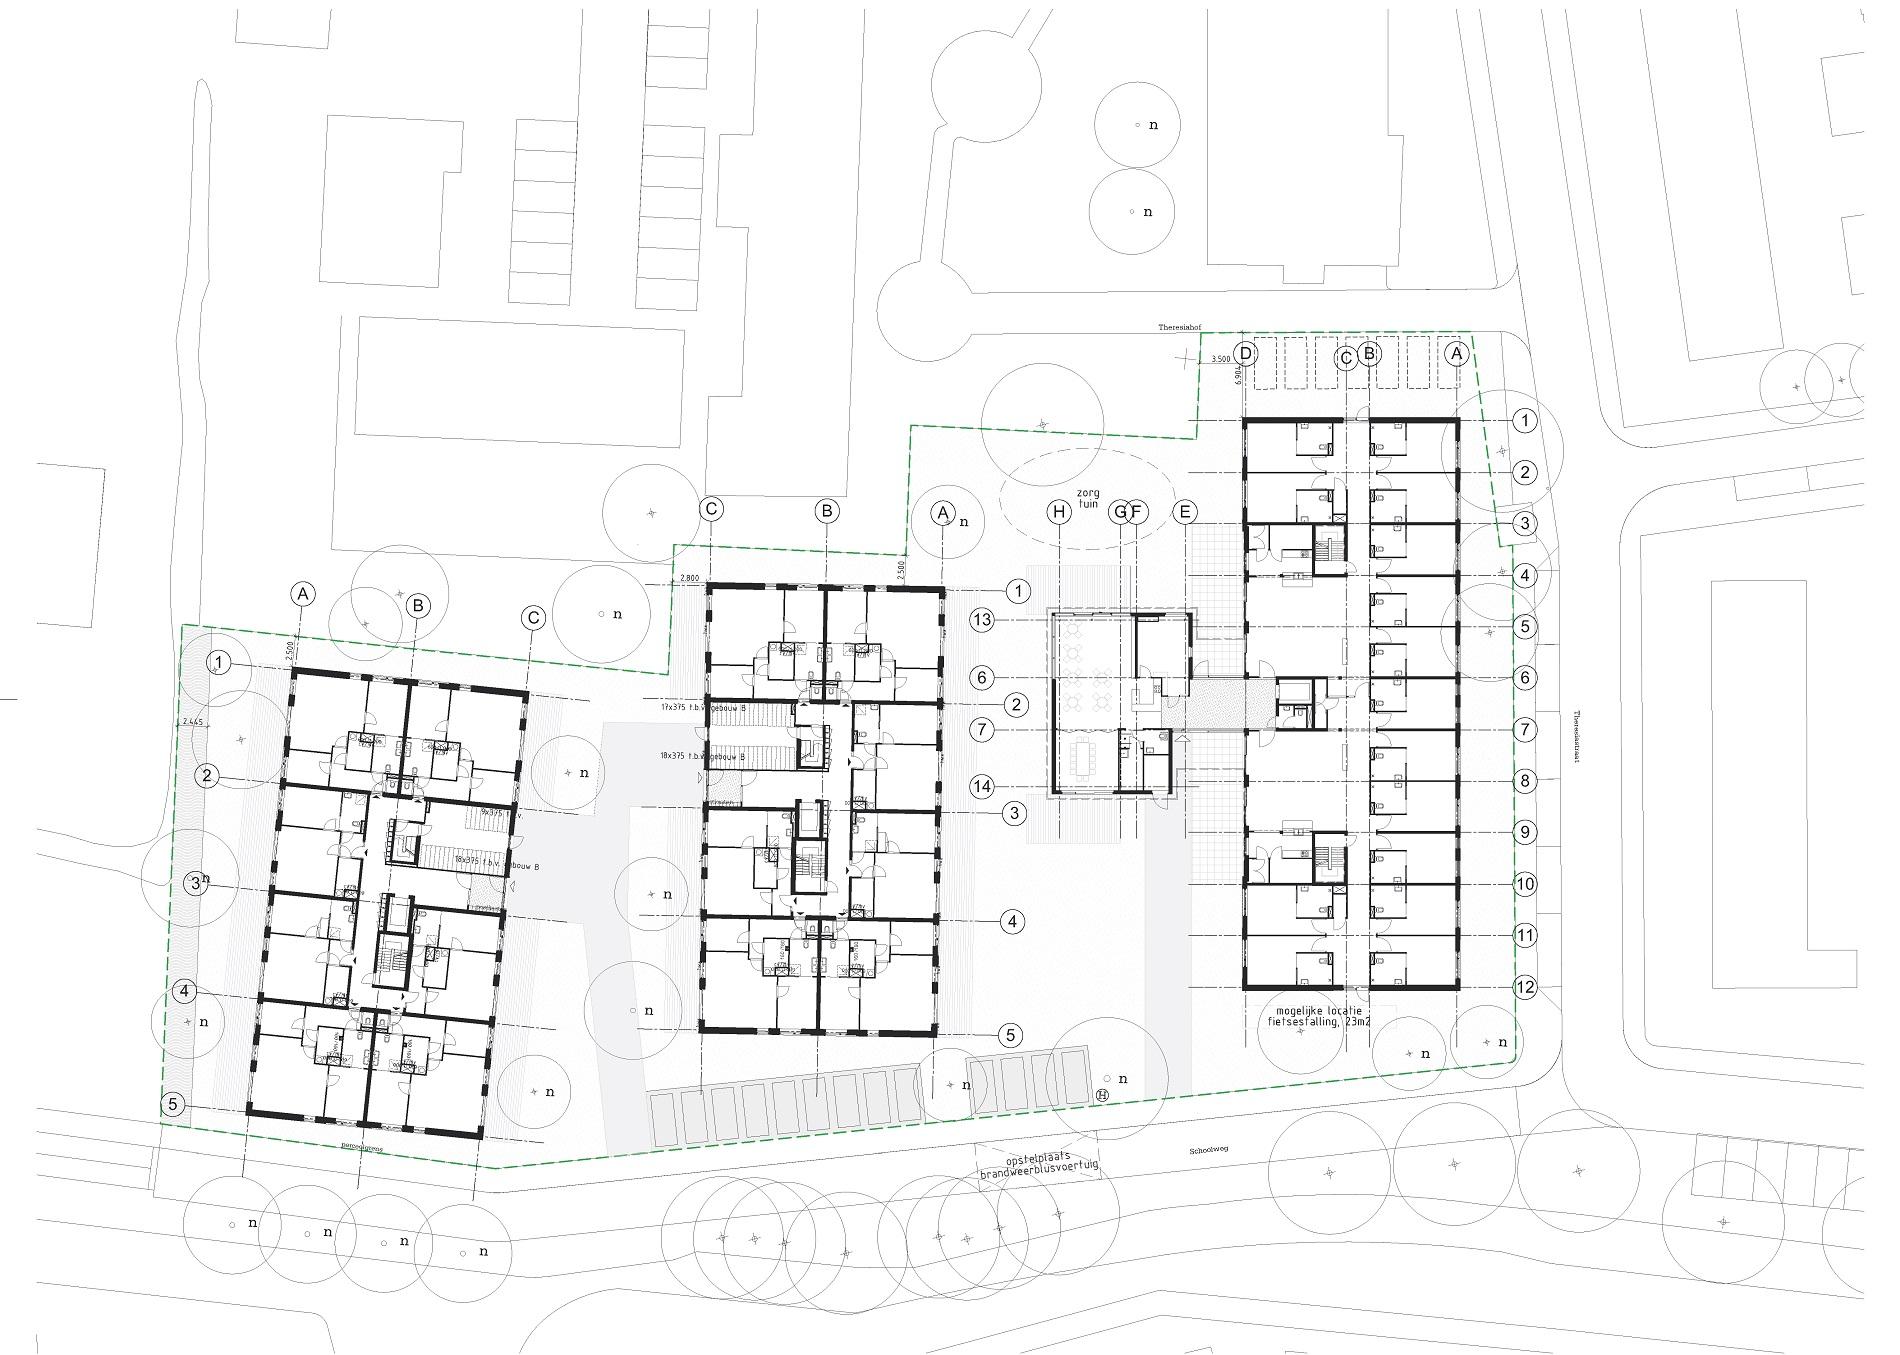 Woonzorgcomplex Theresia Ouderkerk aan de Amstel plattegrond